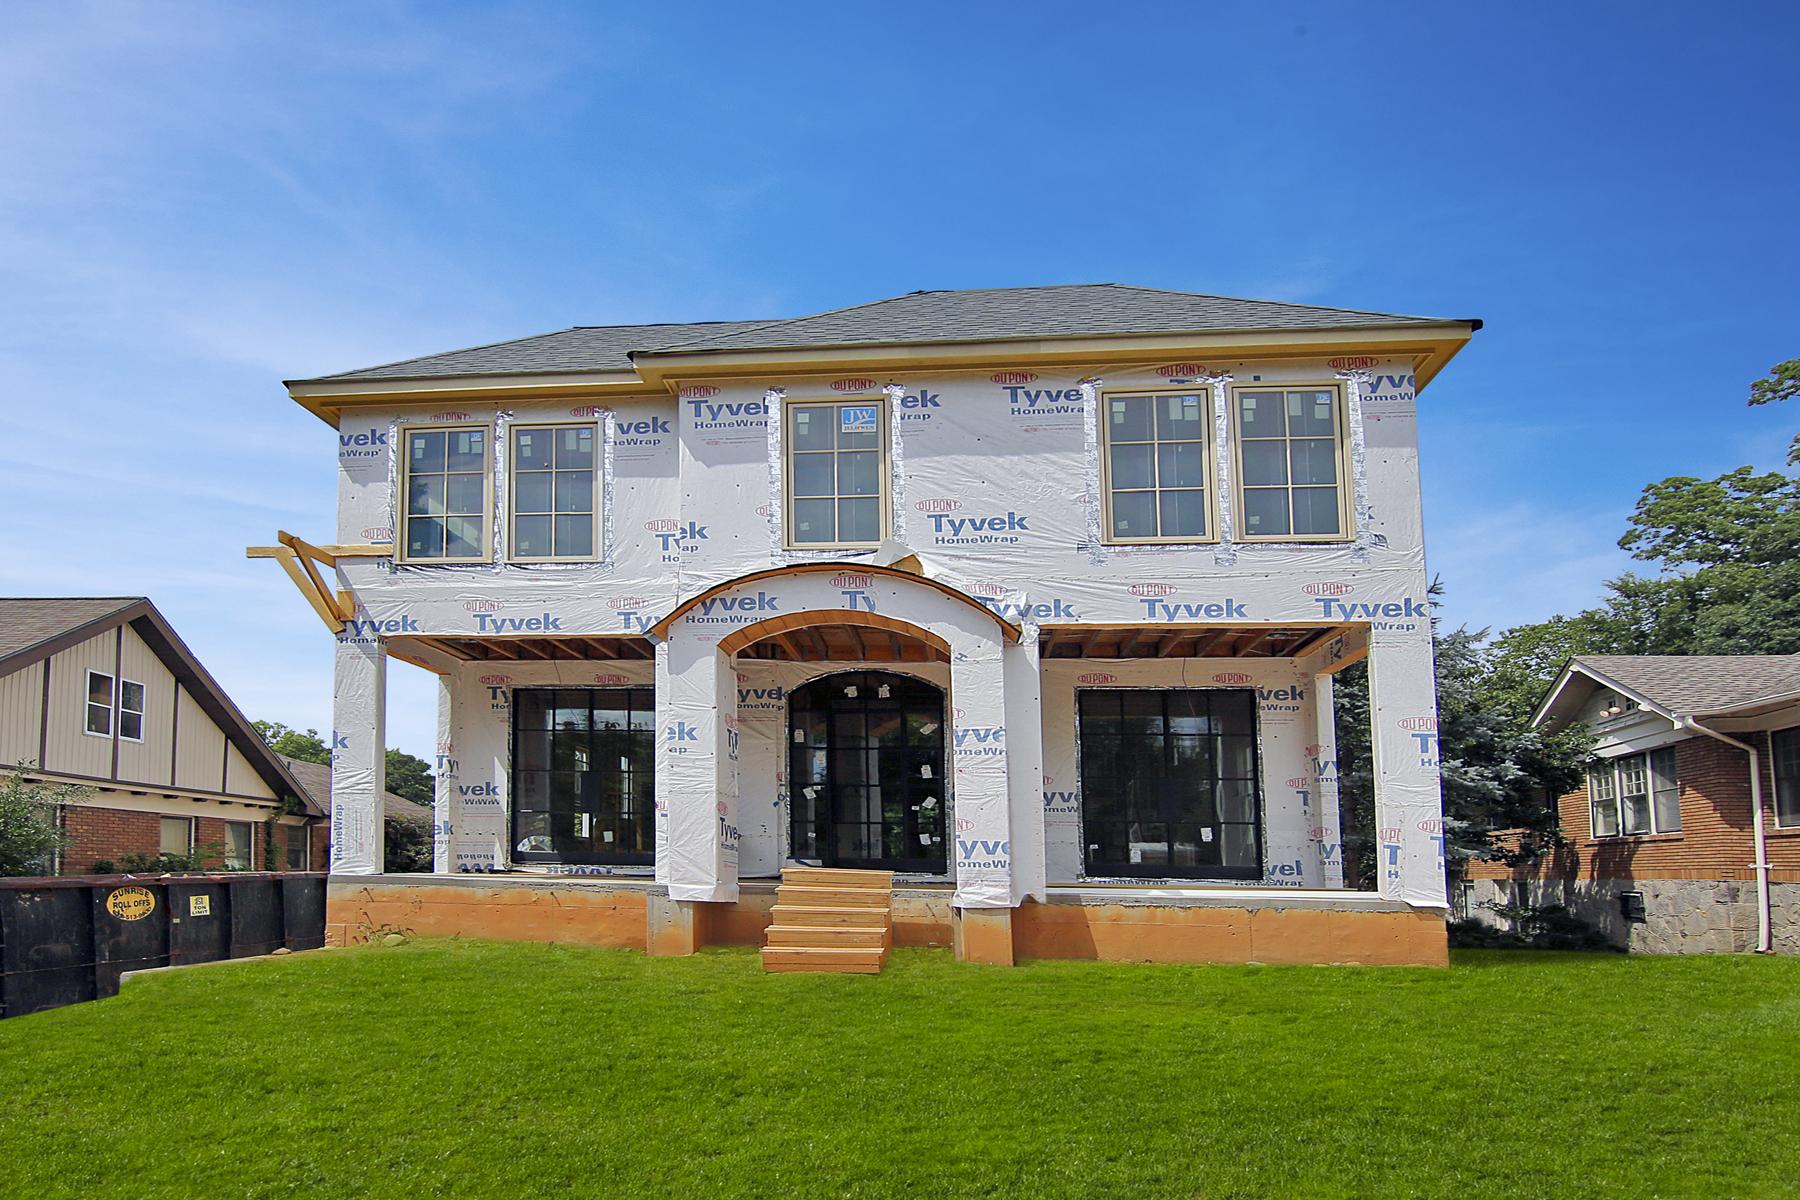 Moradia para Venda às Amazing New Construction In Virginia Highland By Horner Homes, Inc. 654 Park Drive NE Atlanta, Geórgia 30306 Estados Unidos